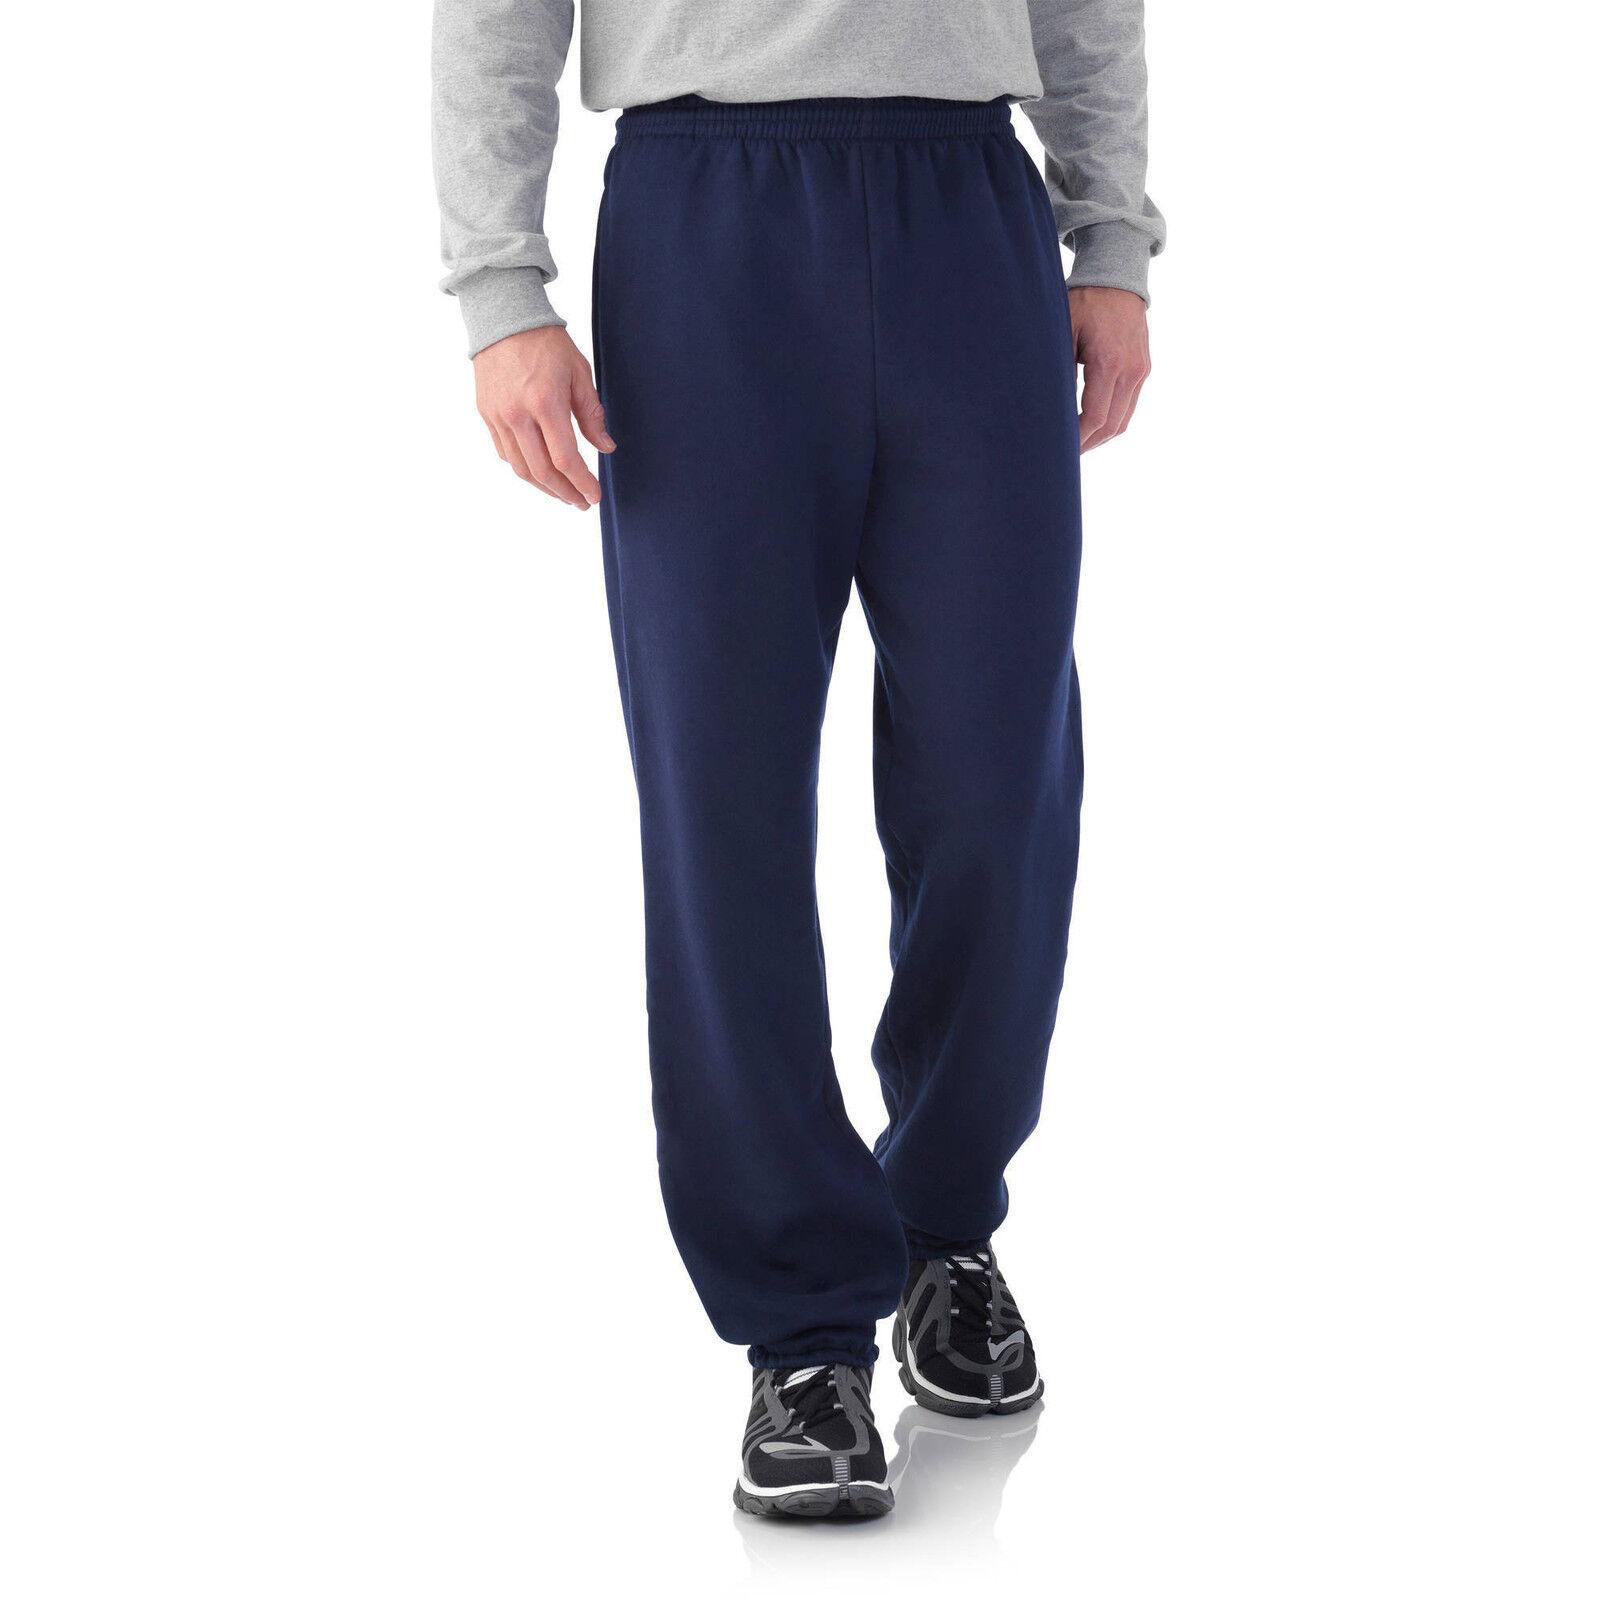 Fruit of the Loom Men's Fleece Elastic Bottom Pant NEW Size